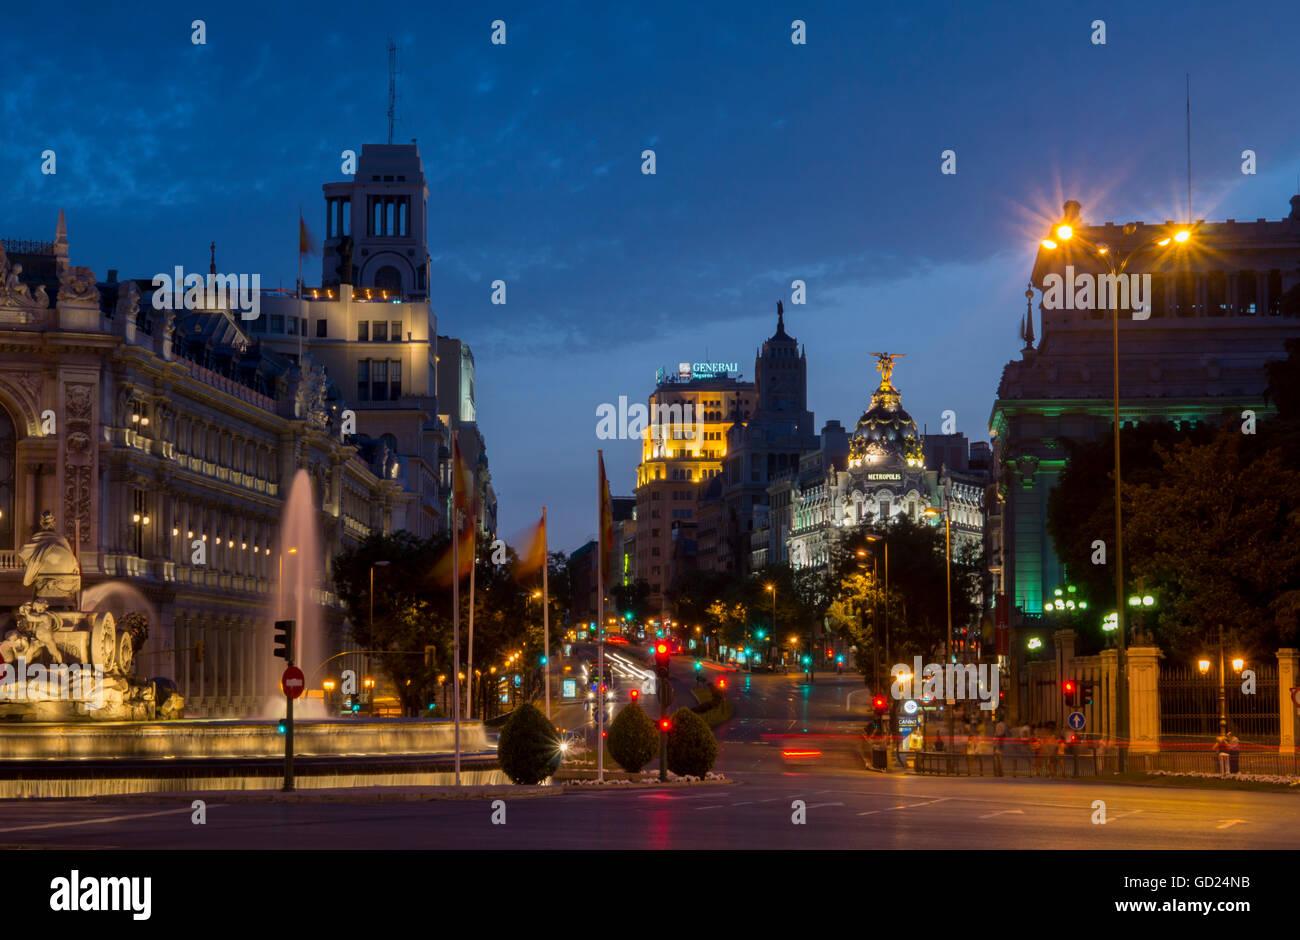 Calle de Alcala, Plaza de Cibeles, Madrid, Spain, Europe - Stock Image